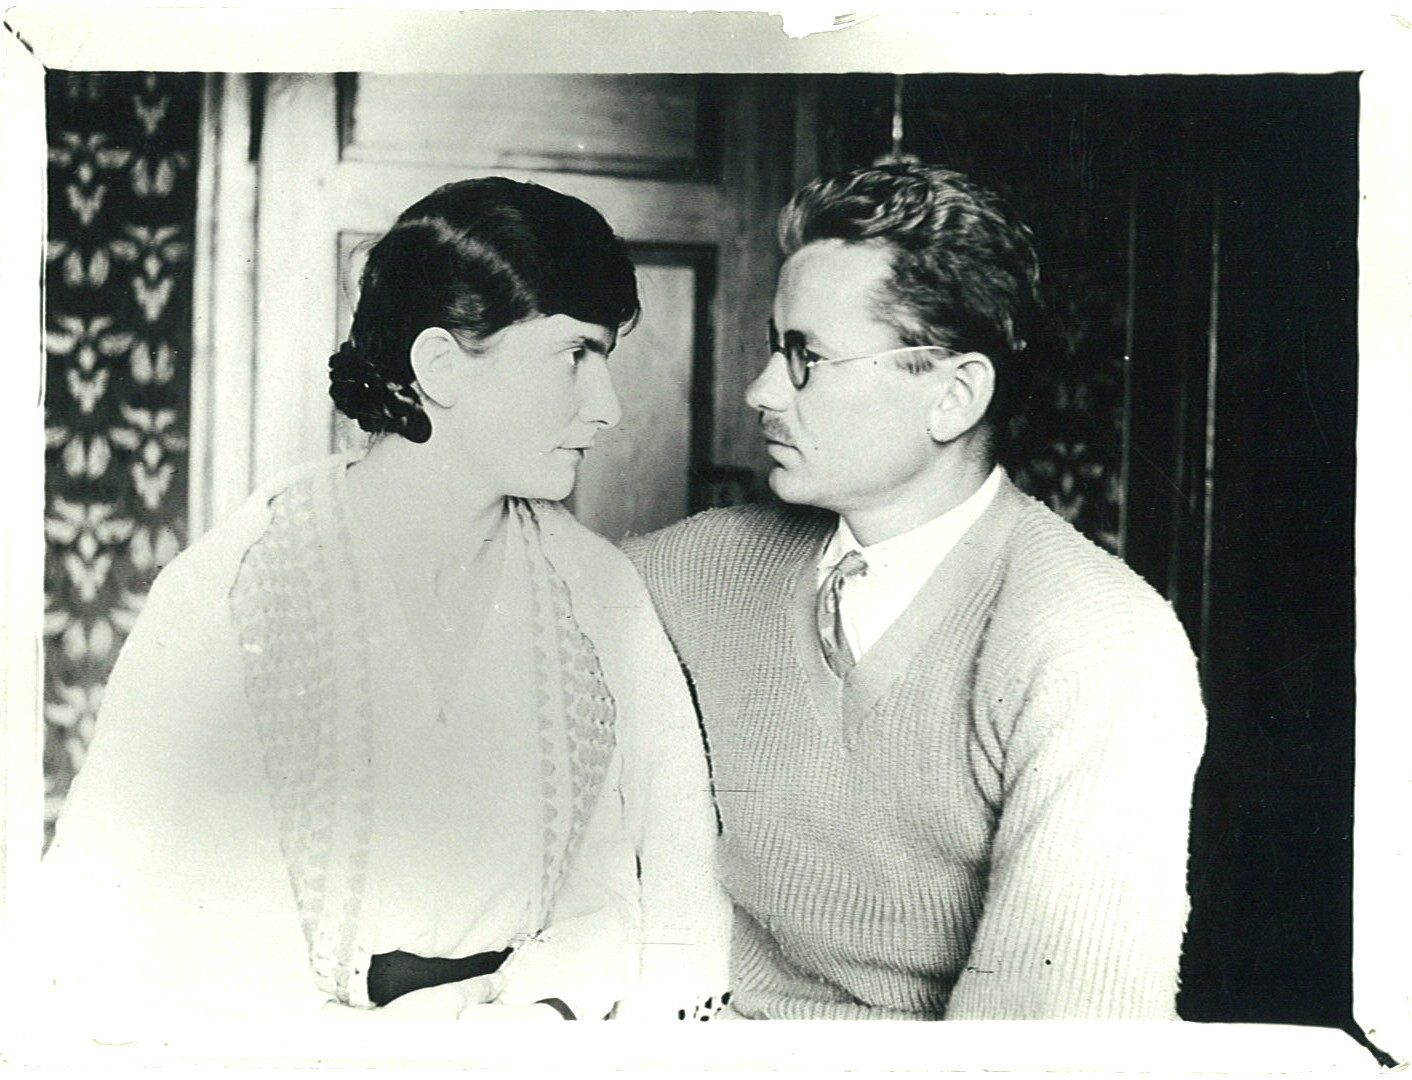 Isabella and Michał Pazdanowski, Gabi's grandparents, photo: Pazdanowski family archive